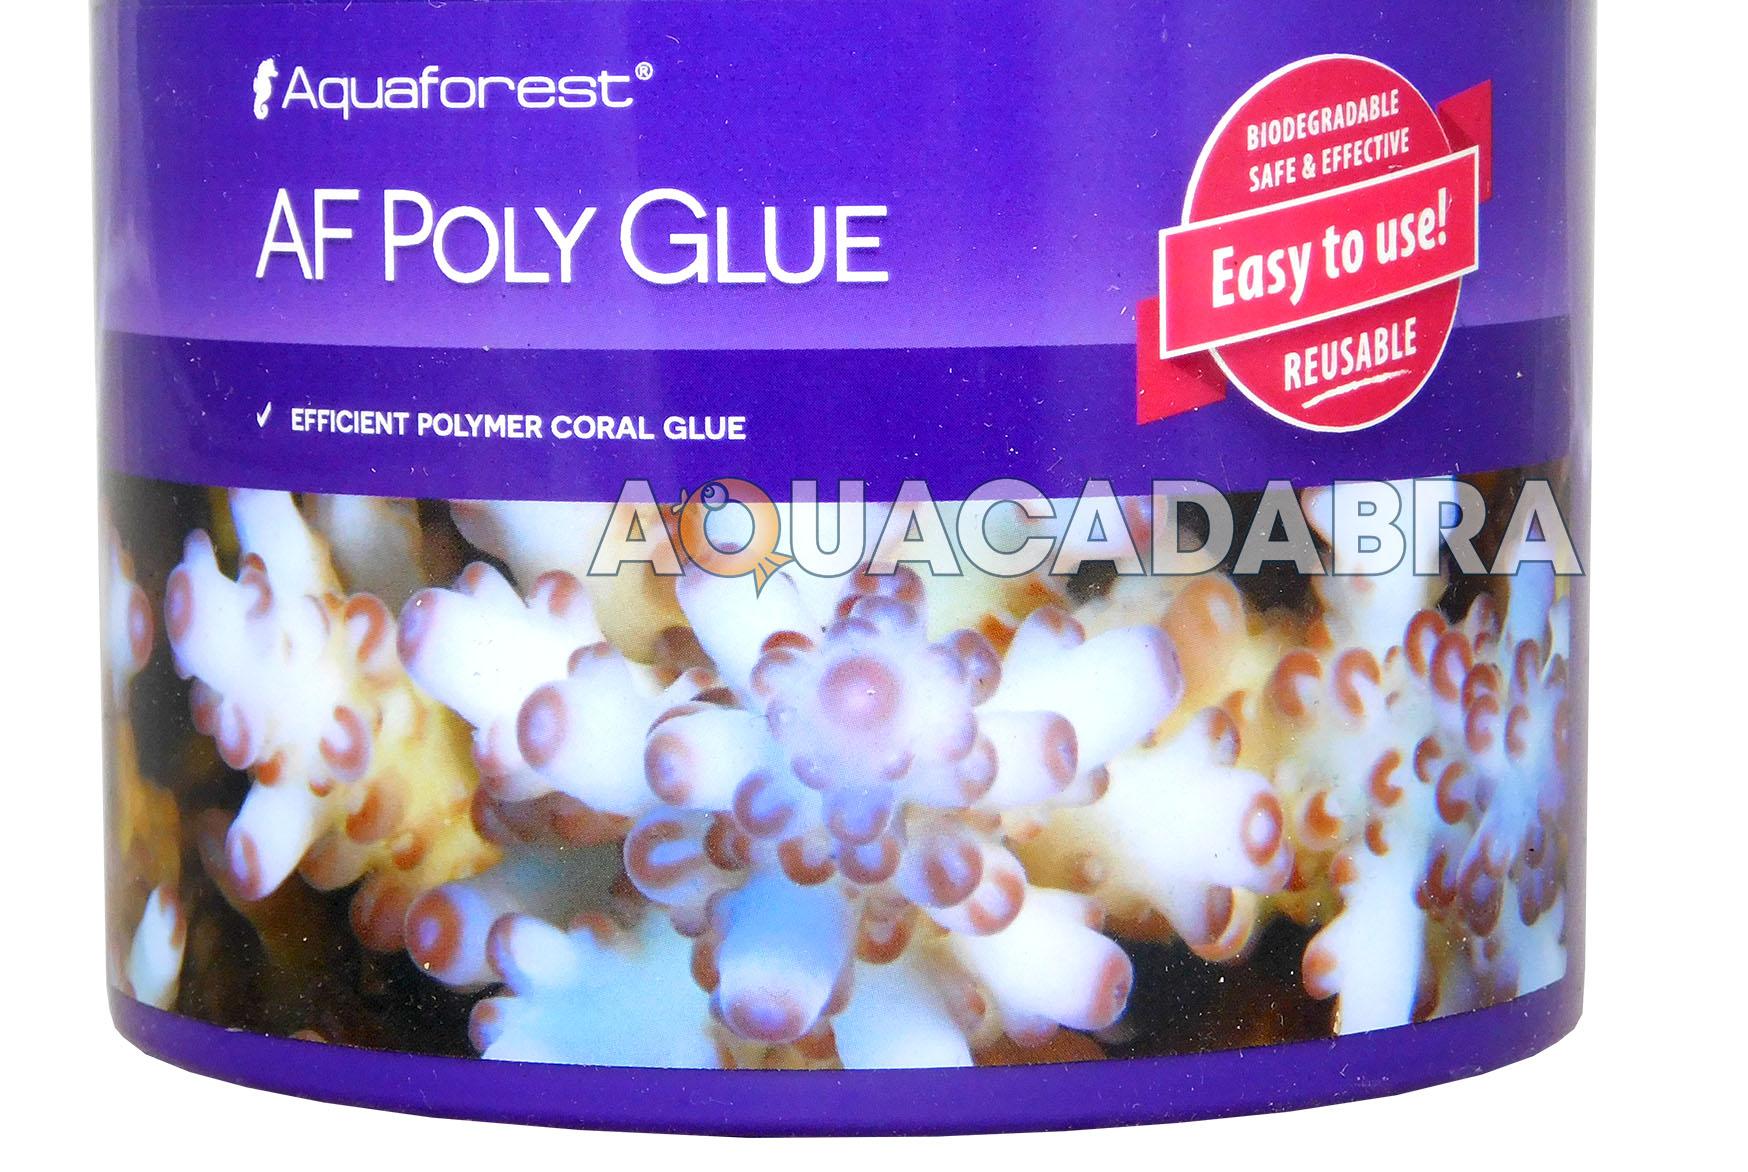 Aquaforest af poly glue 600ml coral polymer adhesive for Fish tank glue